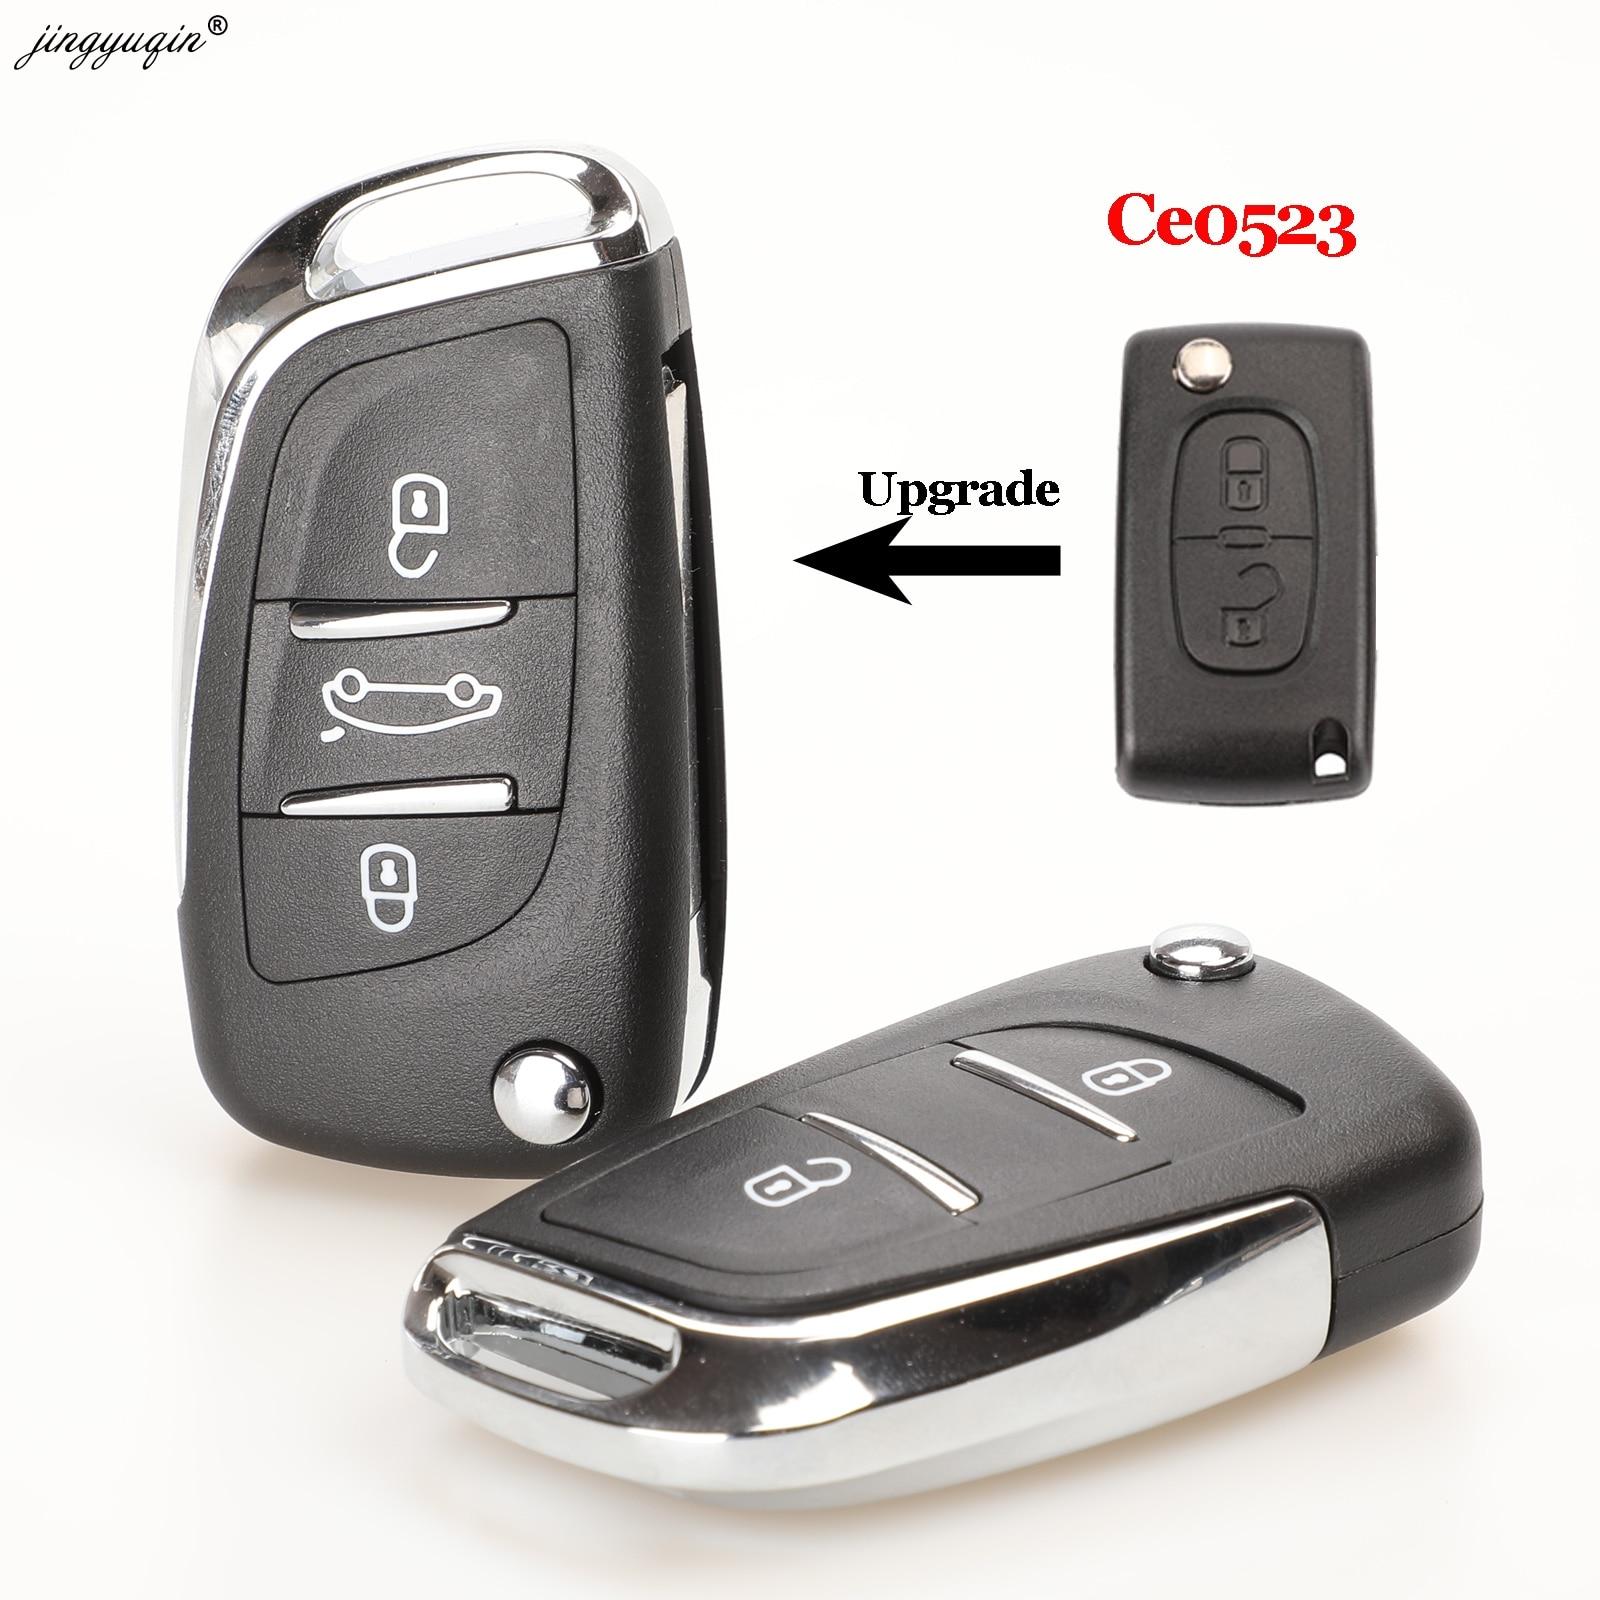 Jingyuqin VA2/HU83 2/3B Ce0523 Modified Flip REMOTE Key SHELL สำหรับ Citroen Coupe VTR C2 C4 c5 C6 C8 Berlingo Xsara Picasso